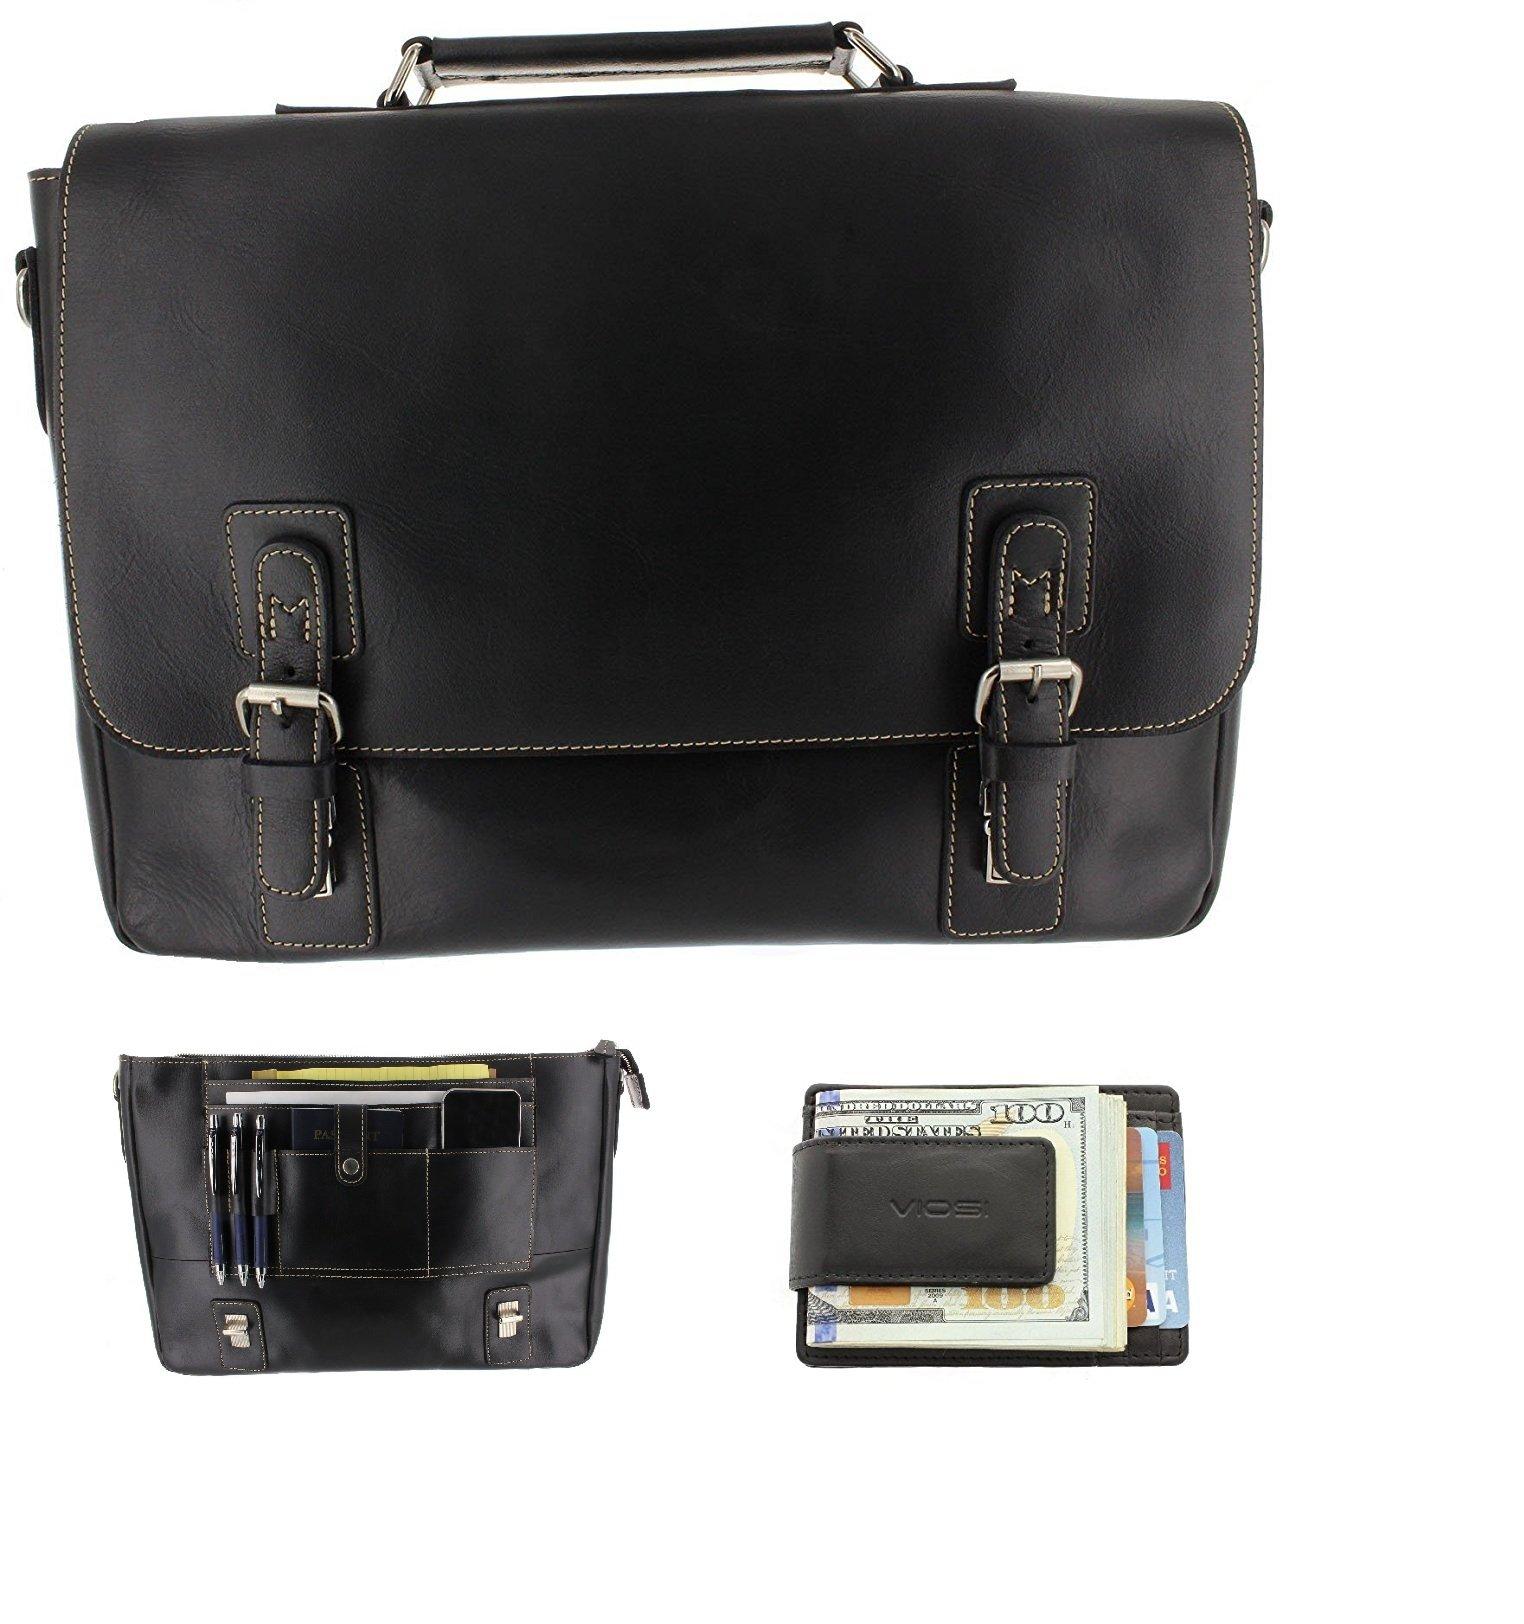 Viosi Mens RFID Leather Messenger Bag / 14 or 16 Inch Laptop Briefcase Shoulder Satchel Bag / RFID Money Clip Included by Viosi